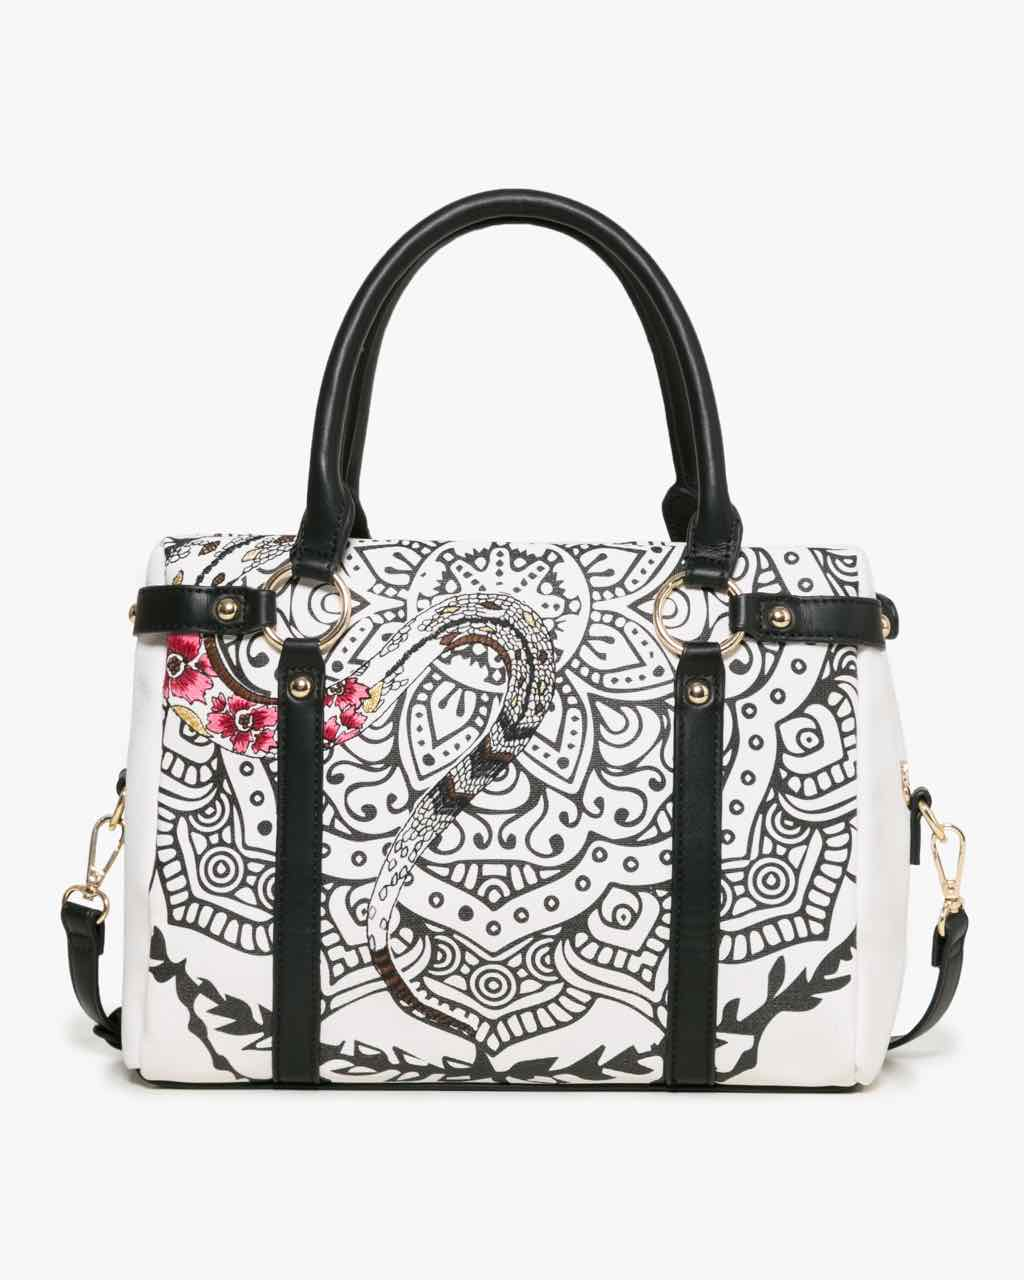 17WAXPJK_1001 Desigual Bag San Marino Ava back Buy Online